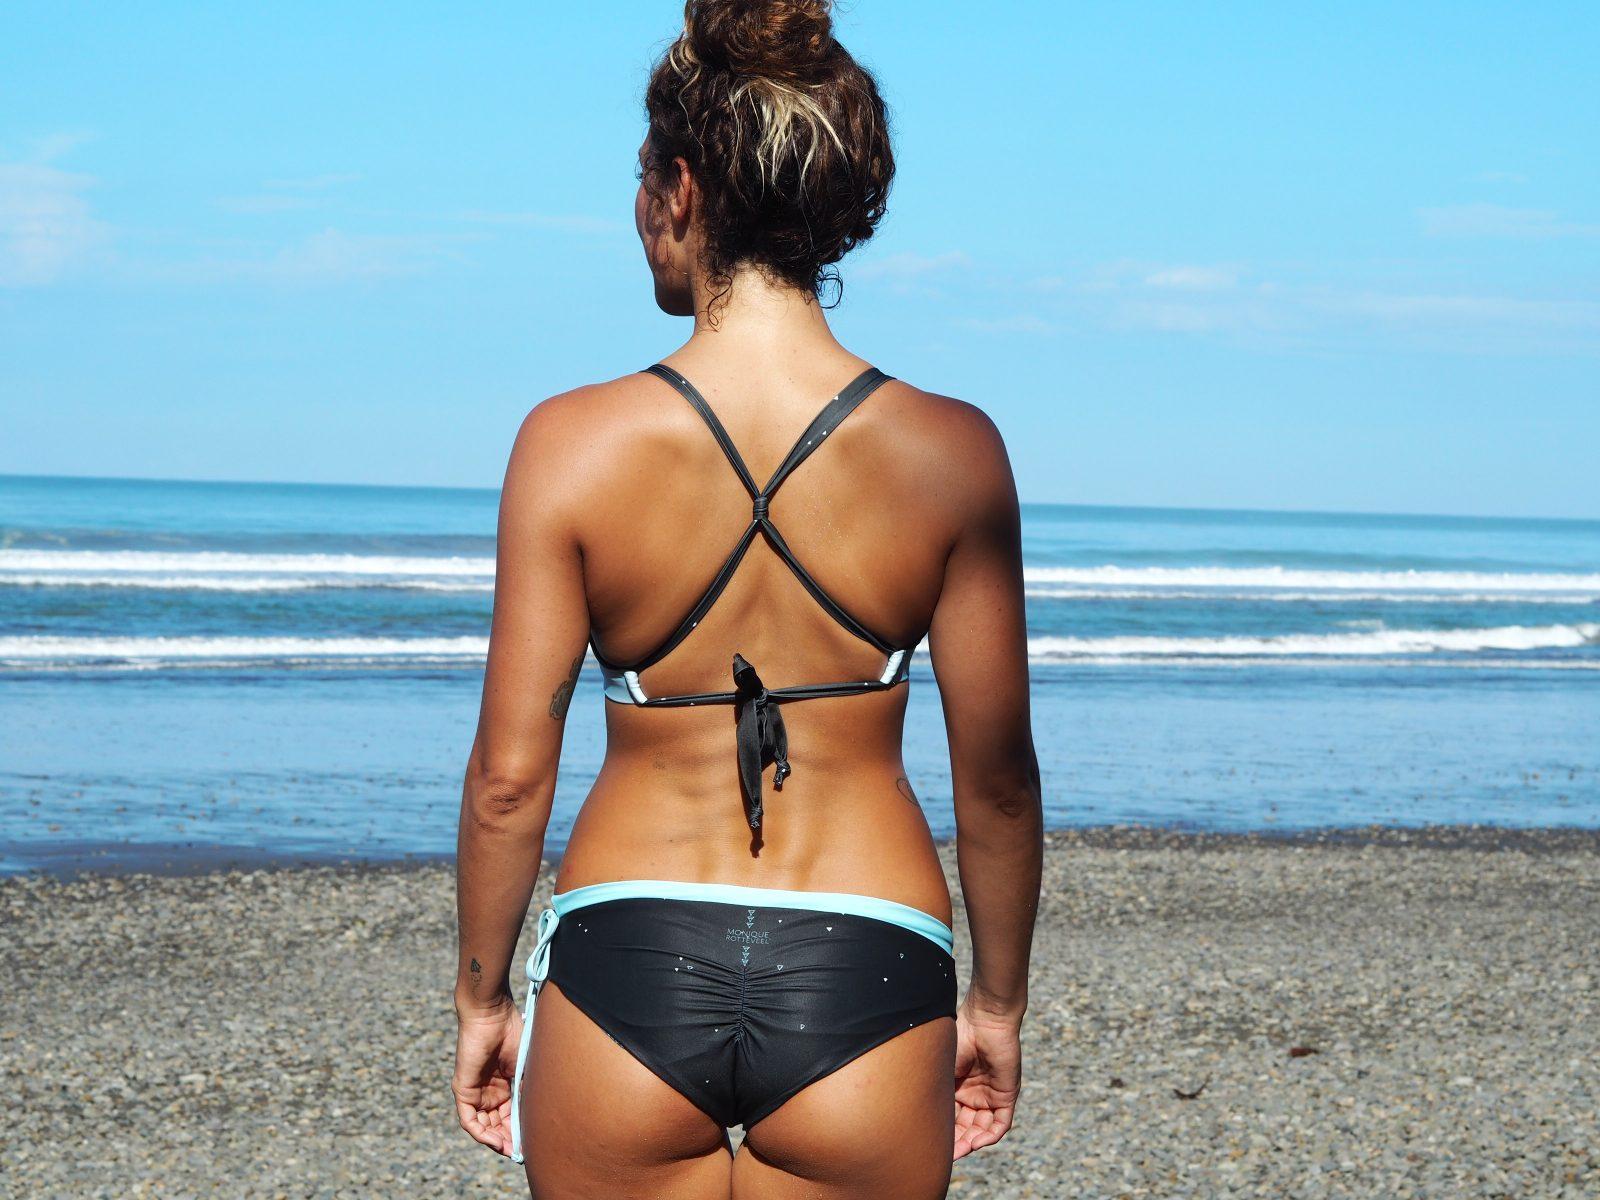 MONIQUE ROTTEVEEL SUSTAINABLE SURFBIKINI BIKINI MADE IN EUROPE